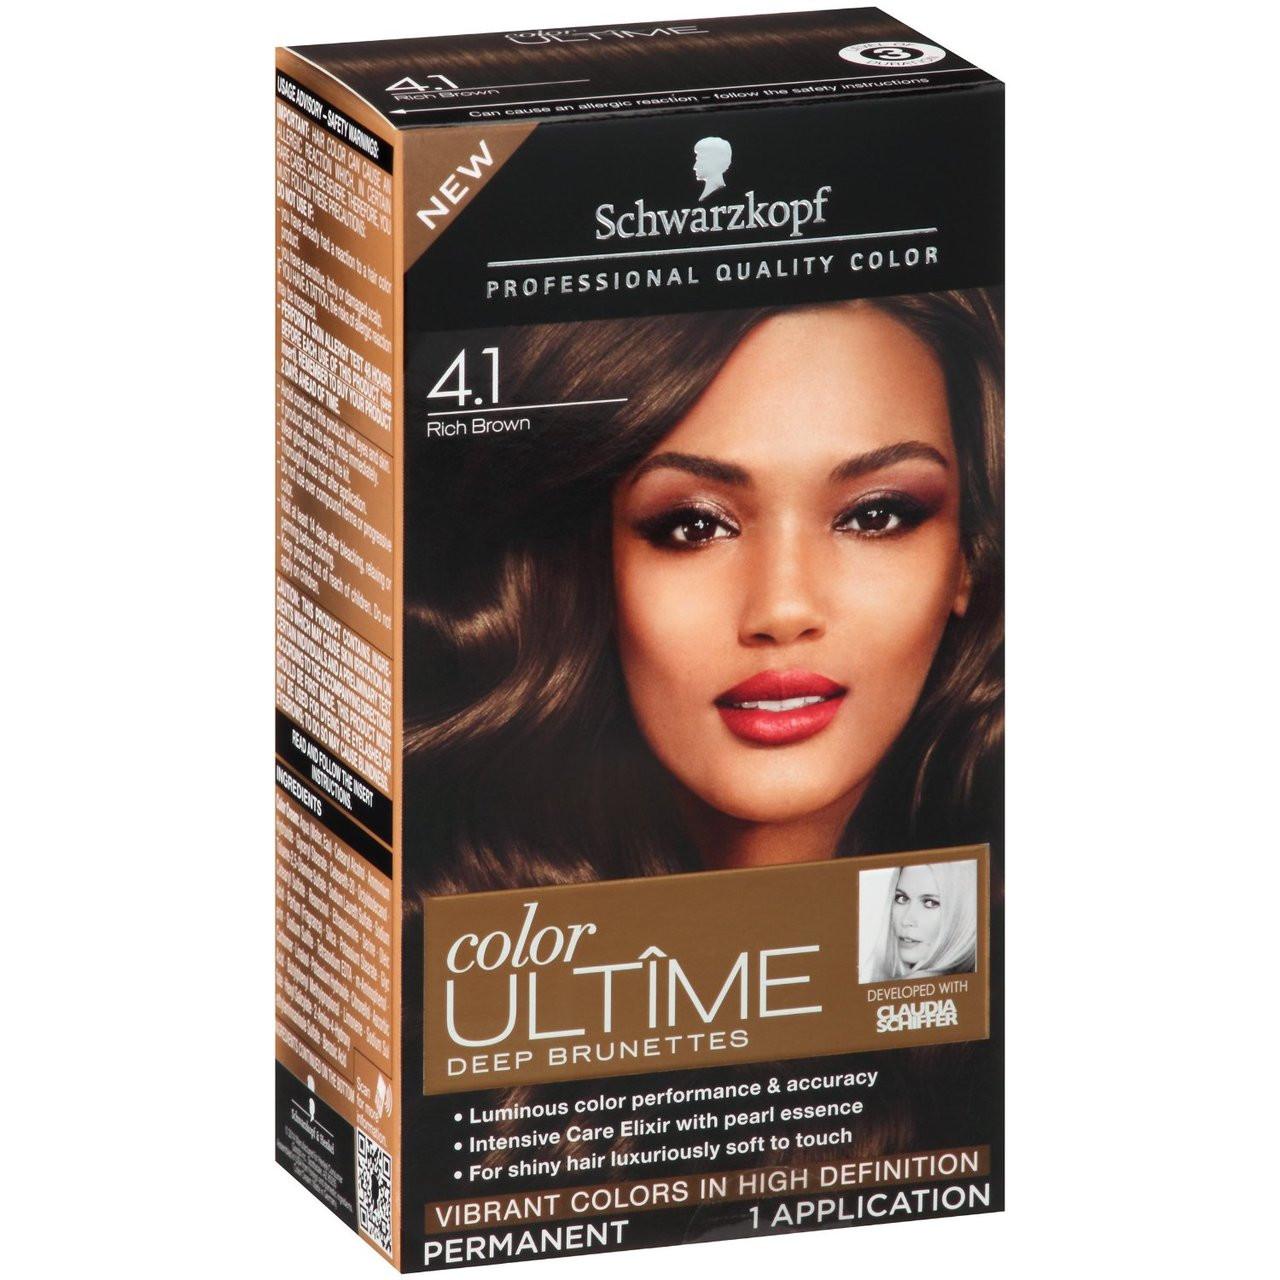 Schwarzkopf Color Ultime Deep Brunettes Permanent Hair Color Kit